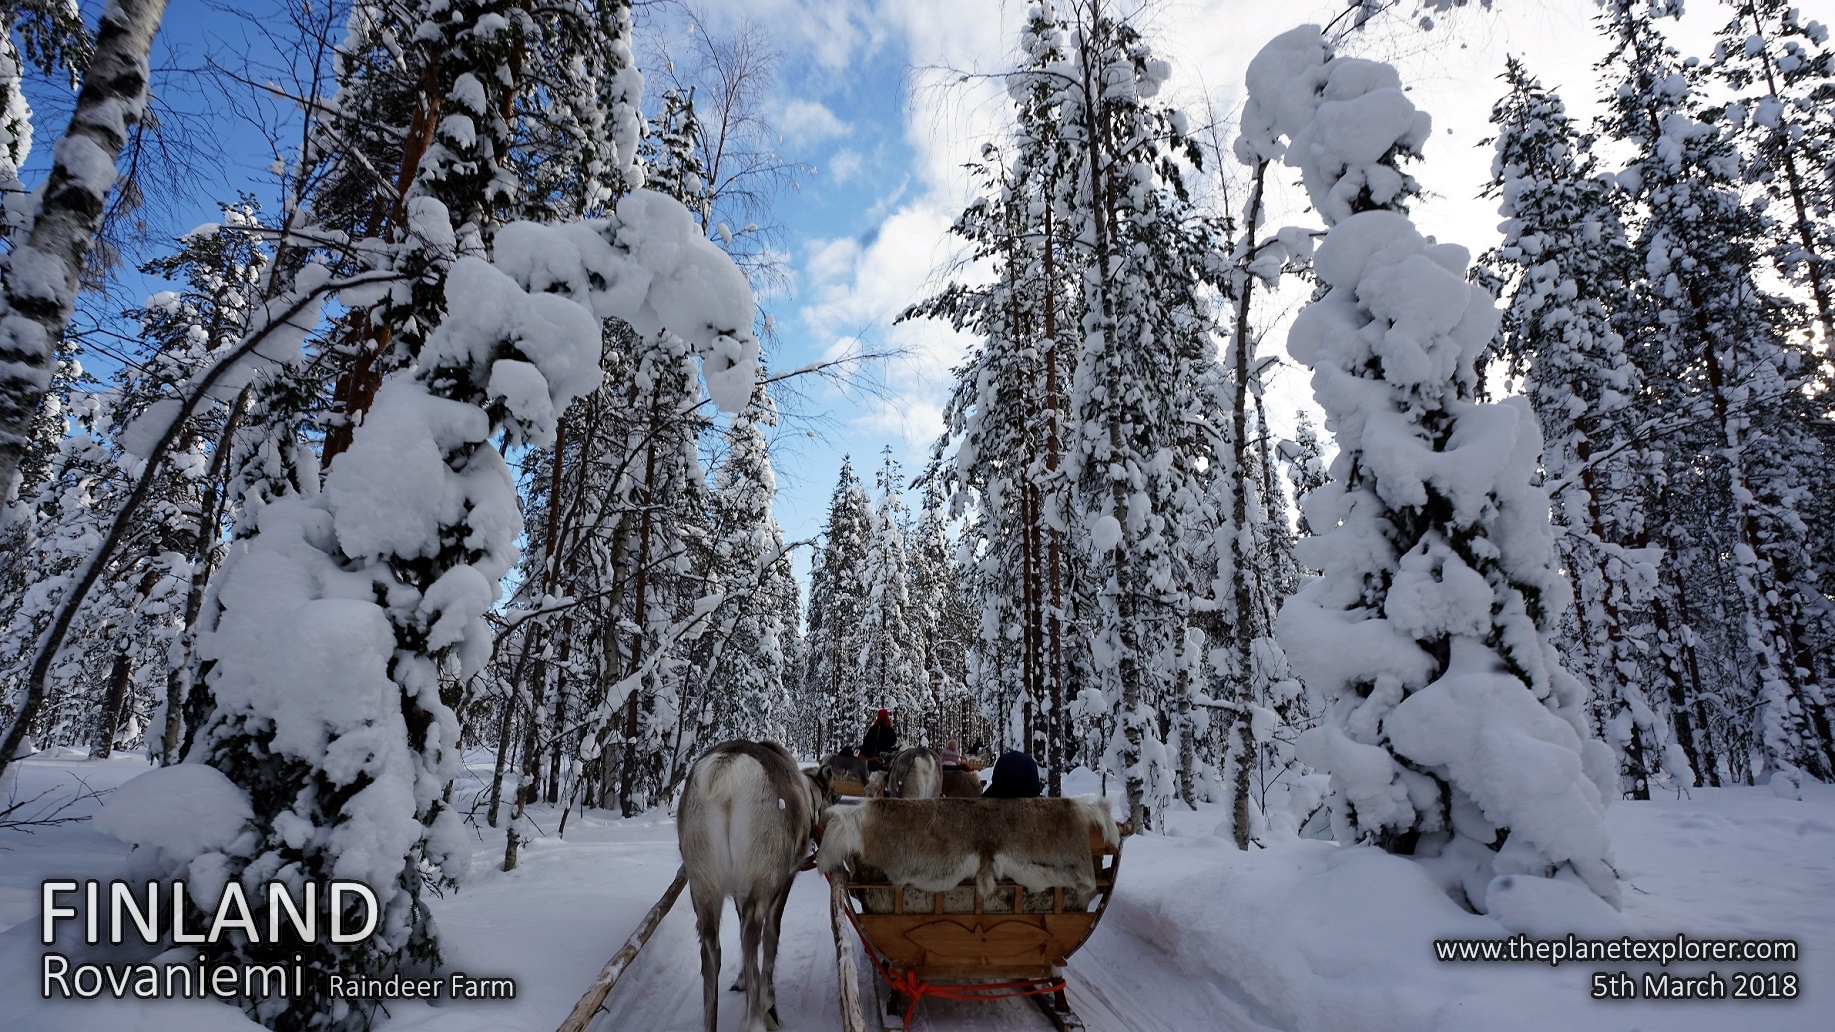 20180305_1136_Finland_Rovaniemi_Raindeer Farm_DSC09436_Sony a7R2_LR_@www